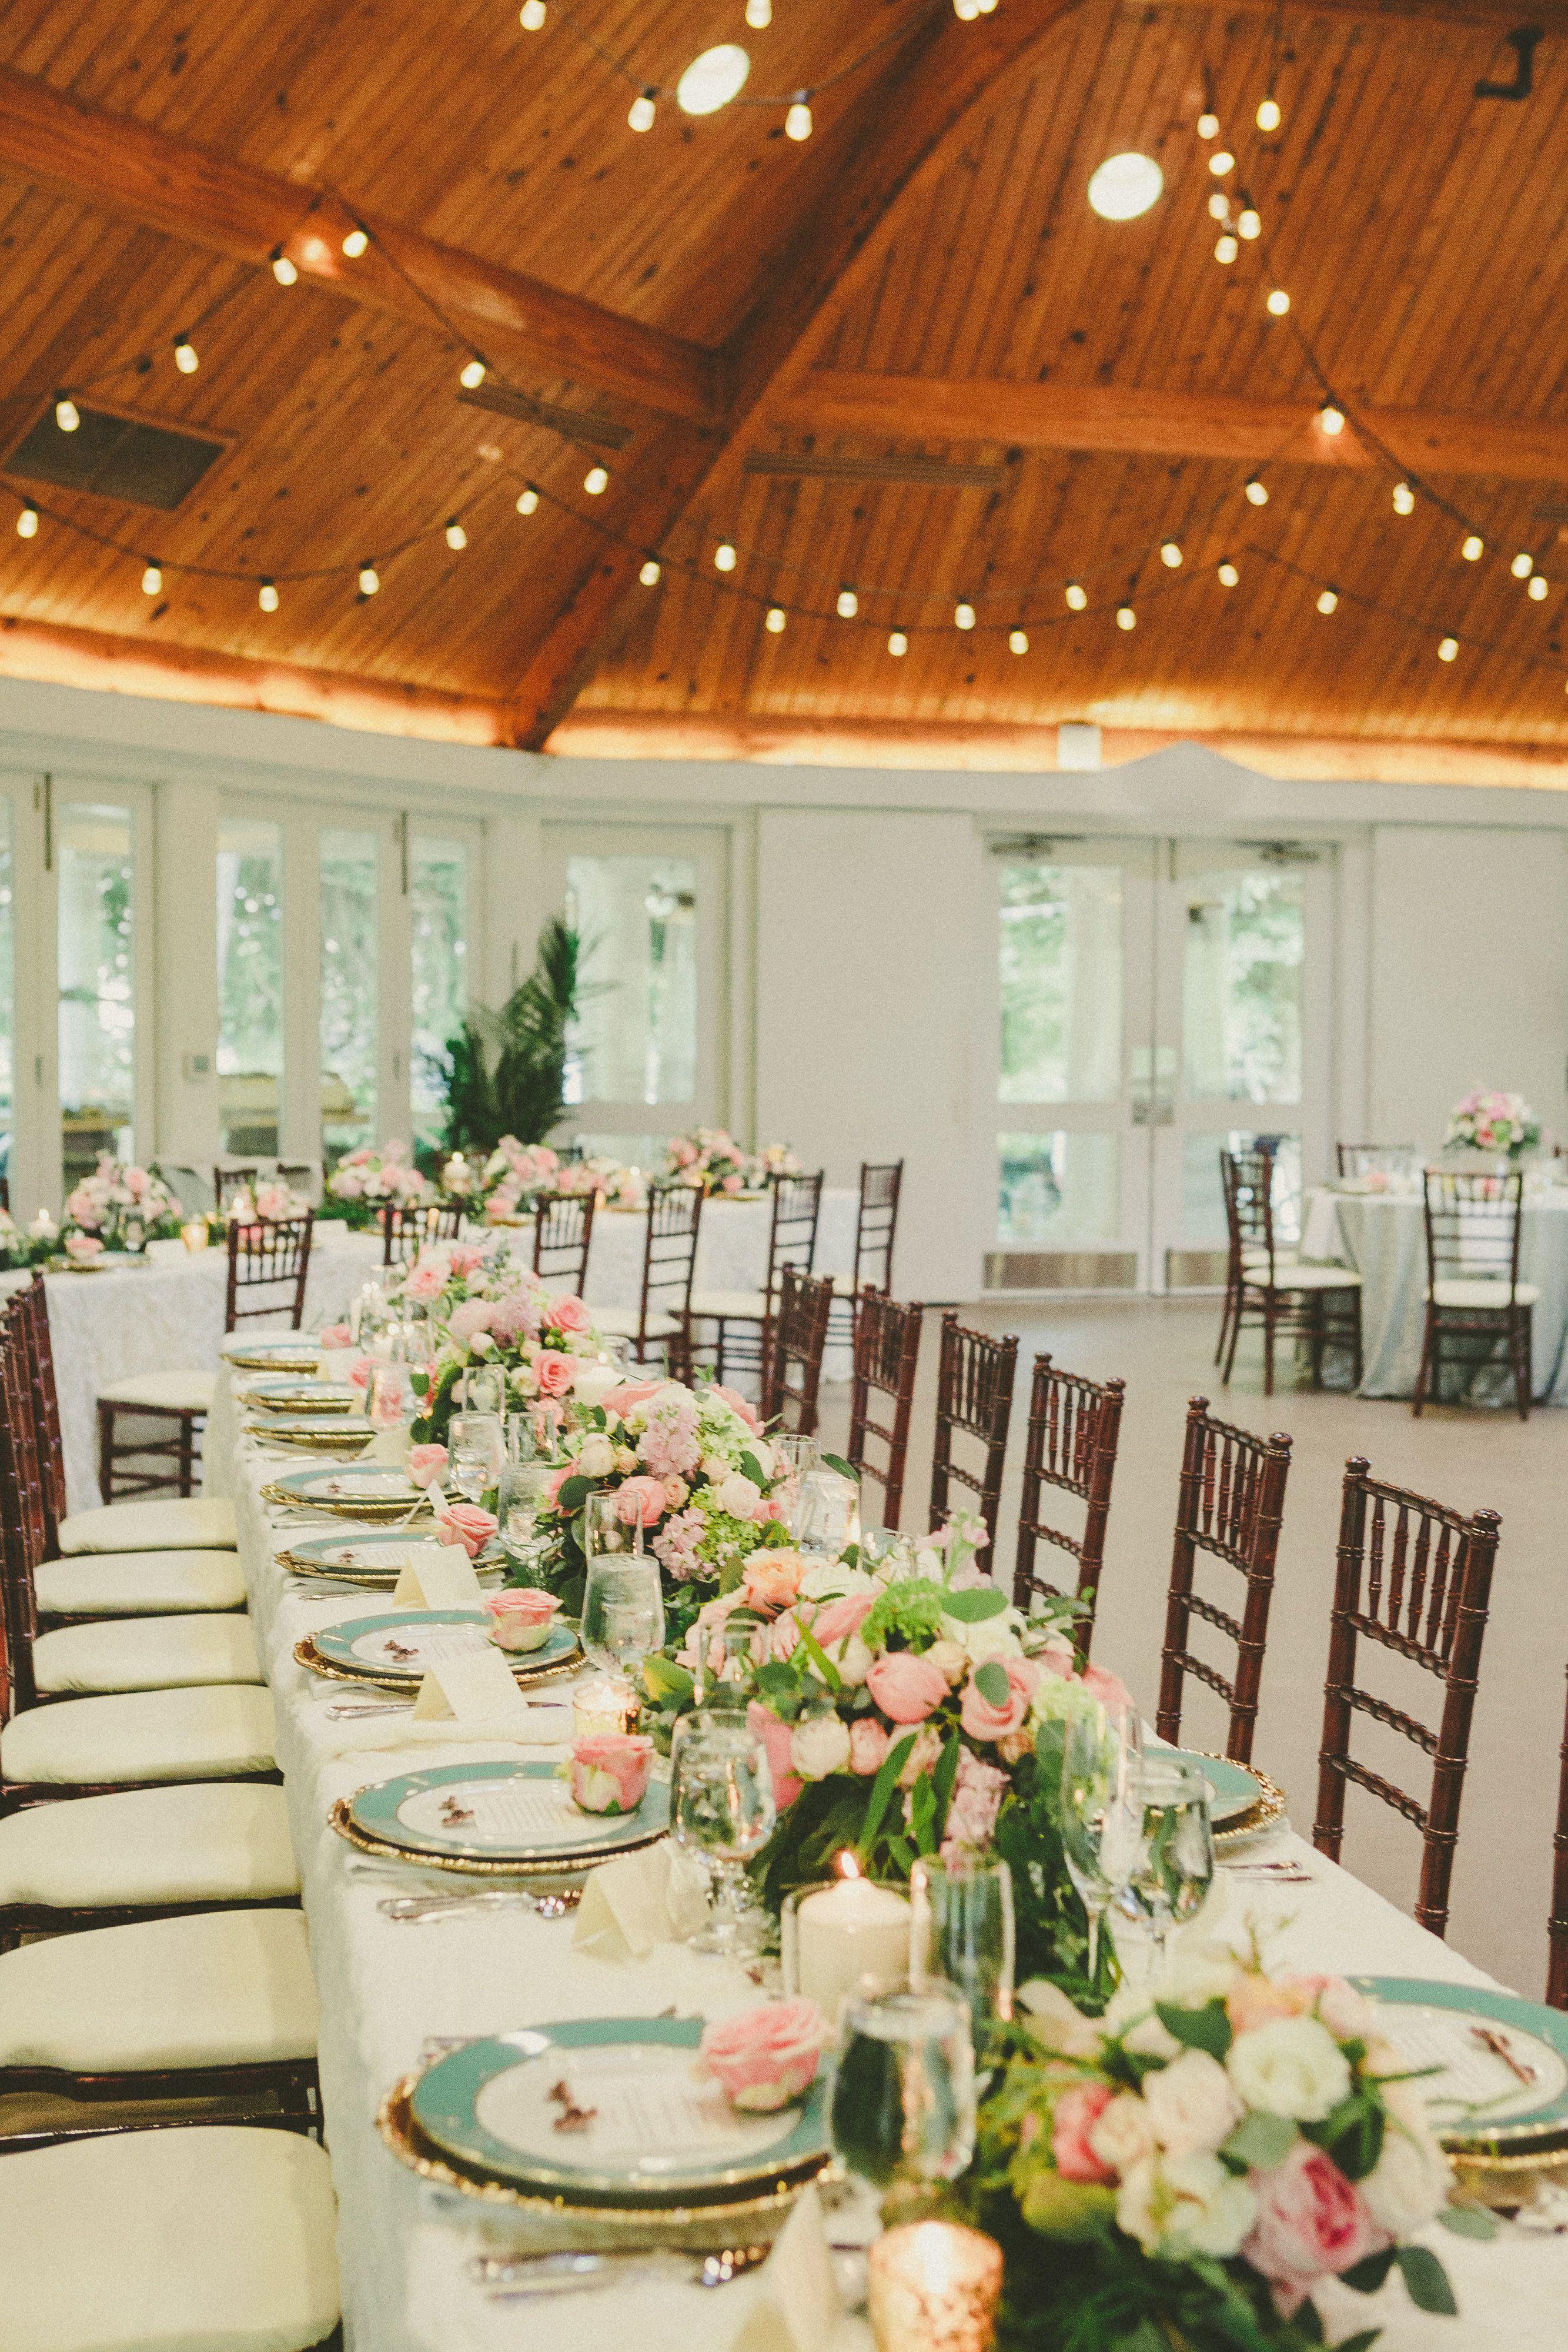 backyard wedding venues in orange county ca%0A Summer wedding in Virginia  Airlie pavilion wedding reception  blue  gold   pink wedding